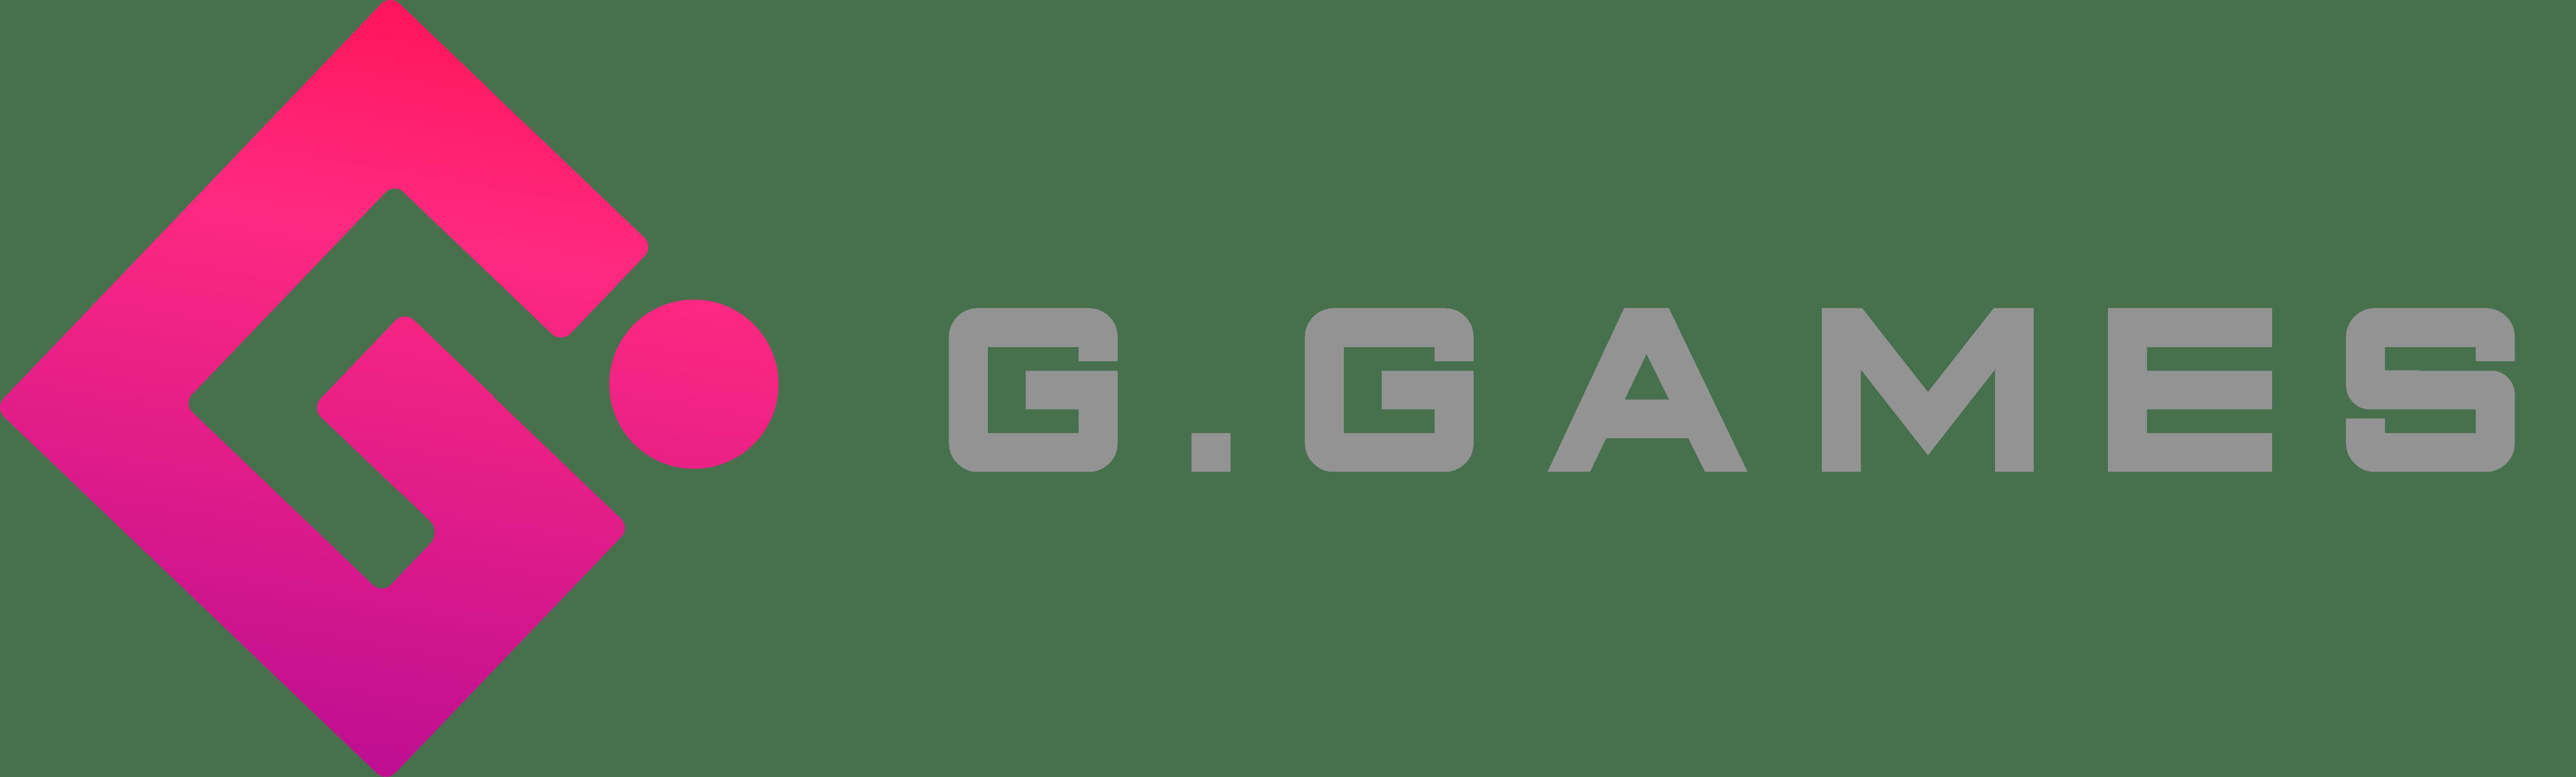 G. Games (Former Gamevy) गेम्स